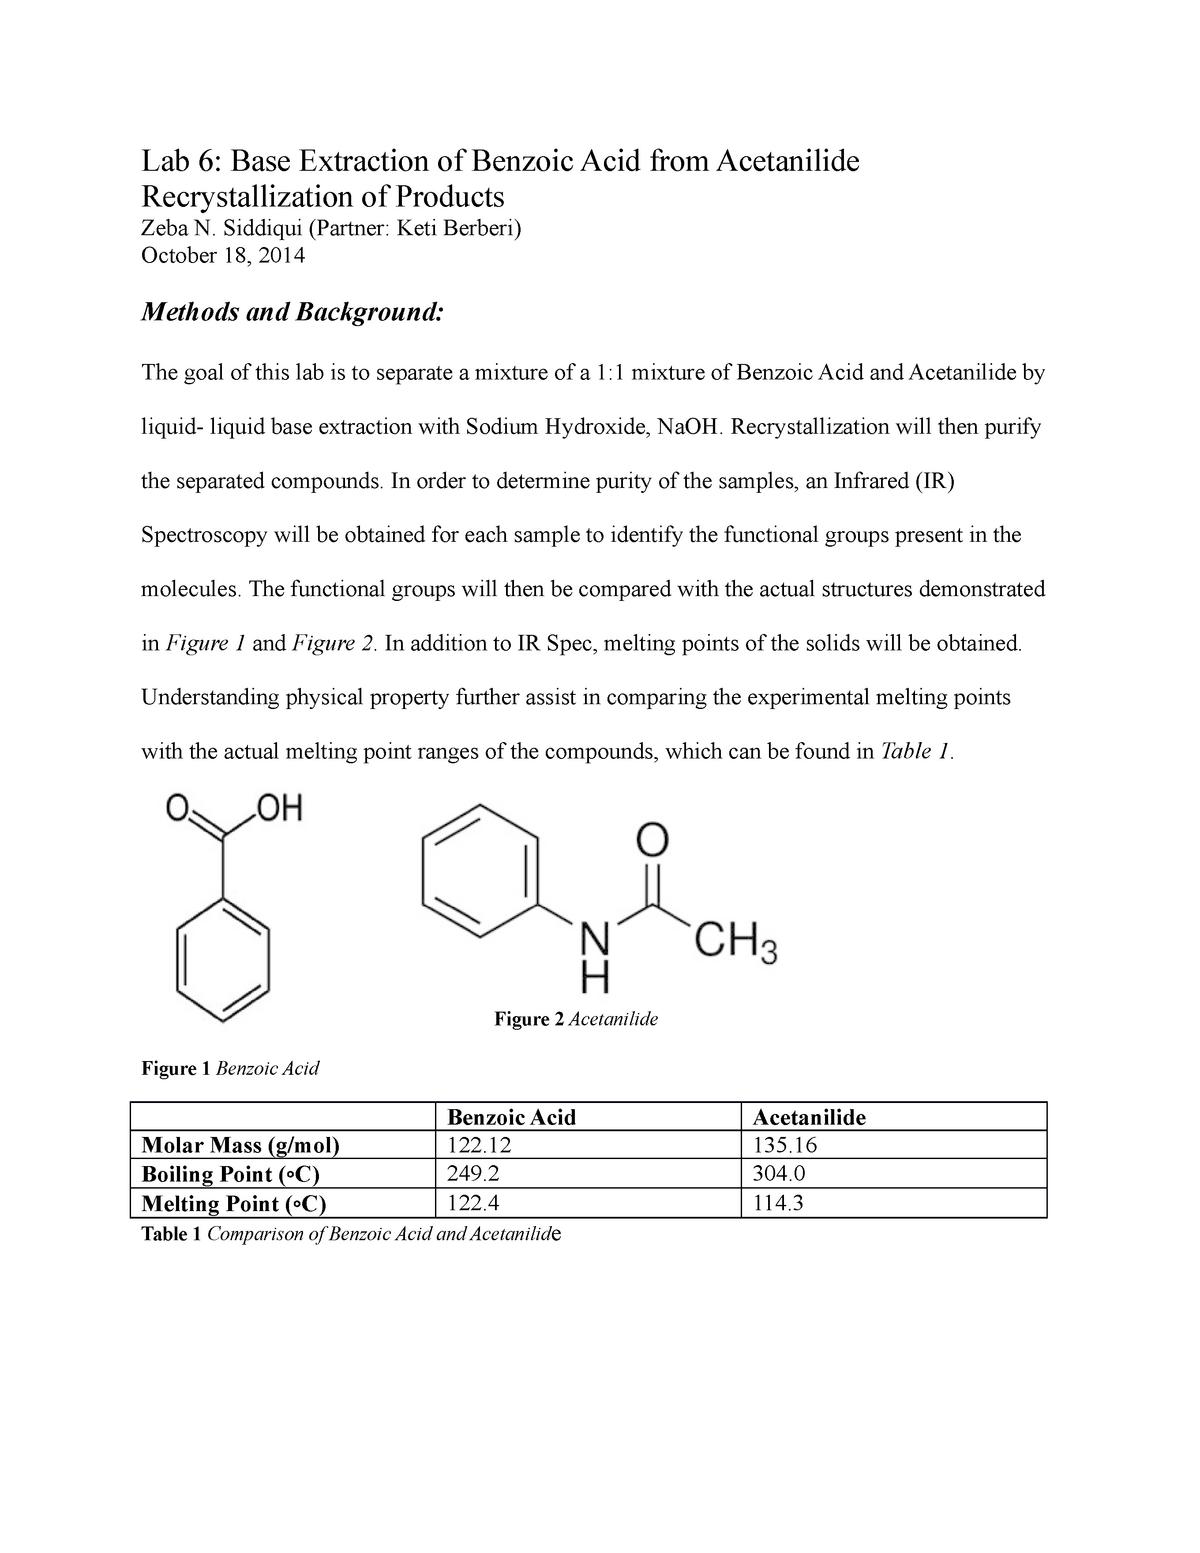 Lab Report 6 - Lecture notes 6 4 - CHEM 233 - UIC - StuDocu